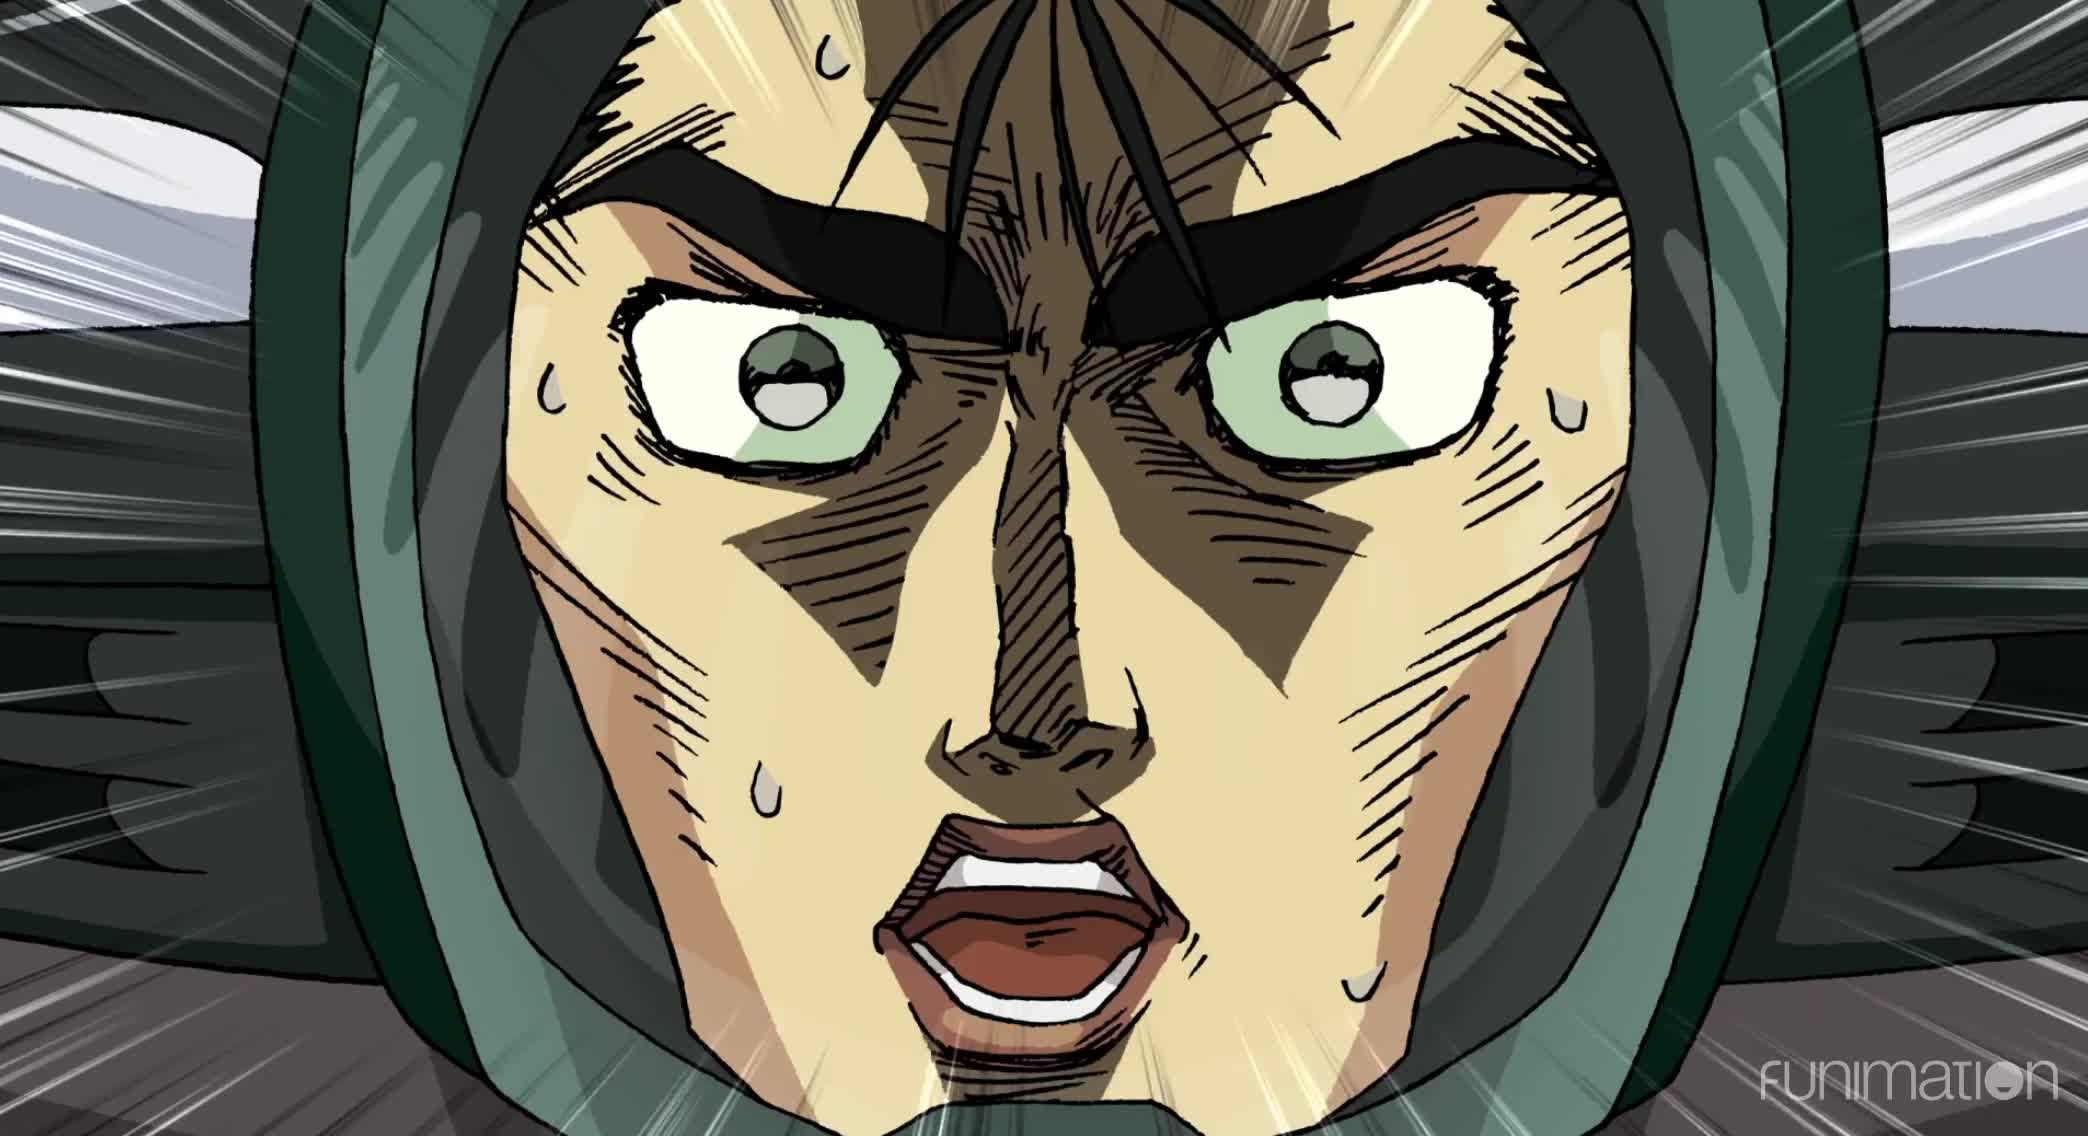 anime, cartoon, comedy, funimation, funny, pop team epic, pop team epic episode 5, GTR goes boom GIFs